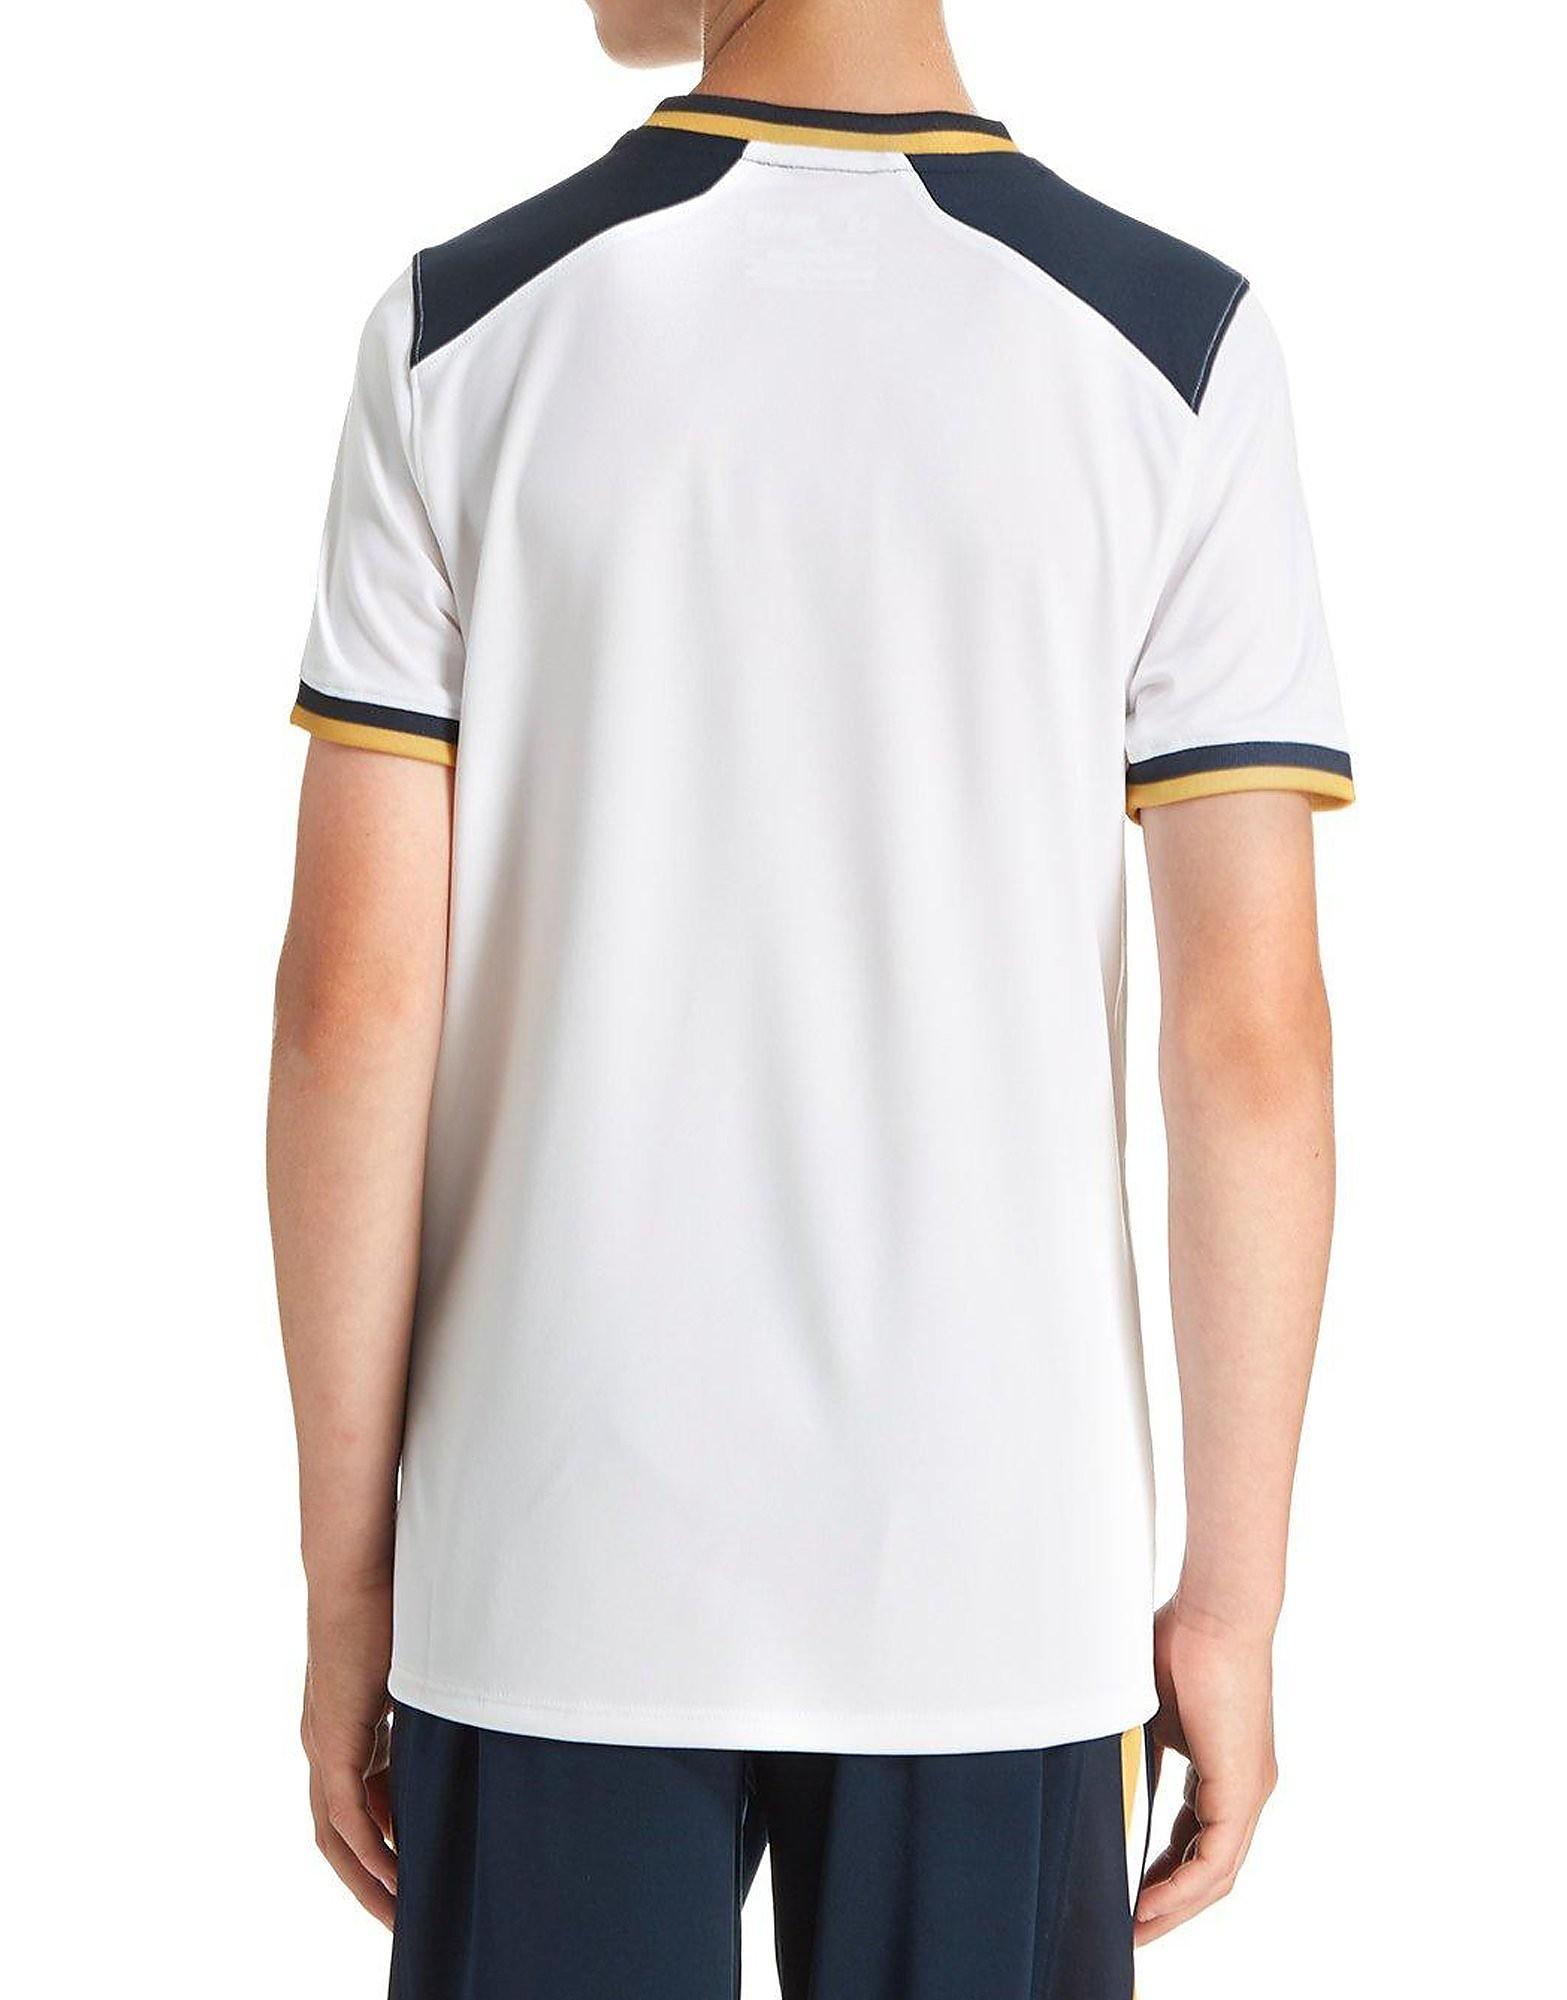 Under Armour Tottenham Hotspur FC 2016/17 Home Shirt Junior